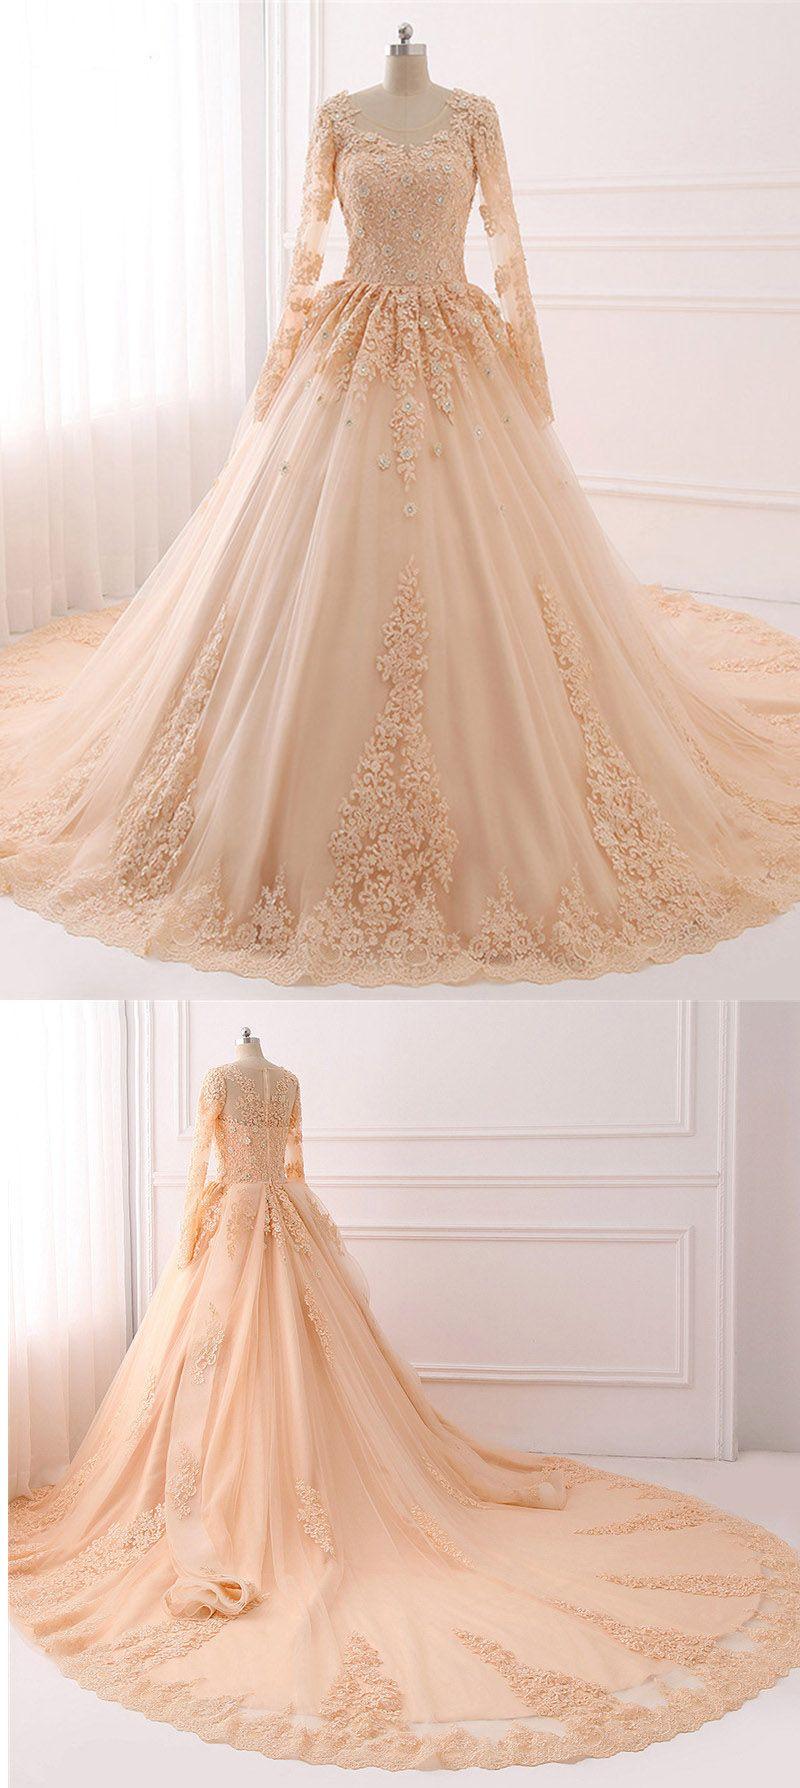 Champagne Vintage Wedding Dress Muslim Bridal Gown With Lace Wd687 Muslim Bridal Dresses Wedding Dress Muslim [ 1788 x 800 Pixel ]